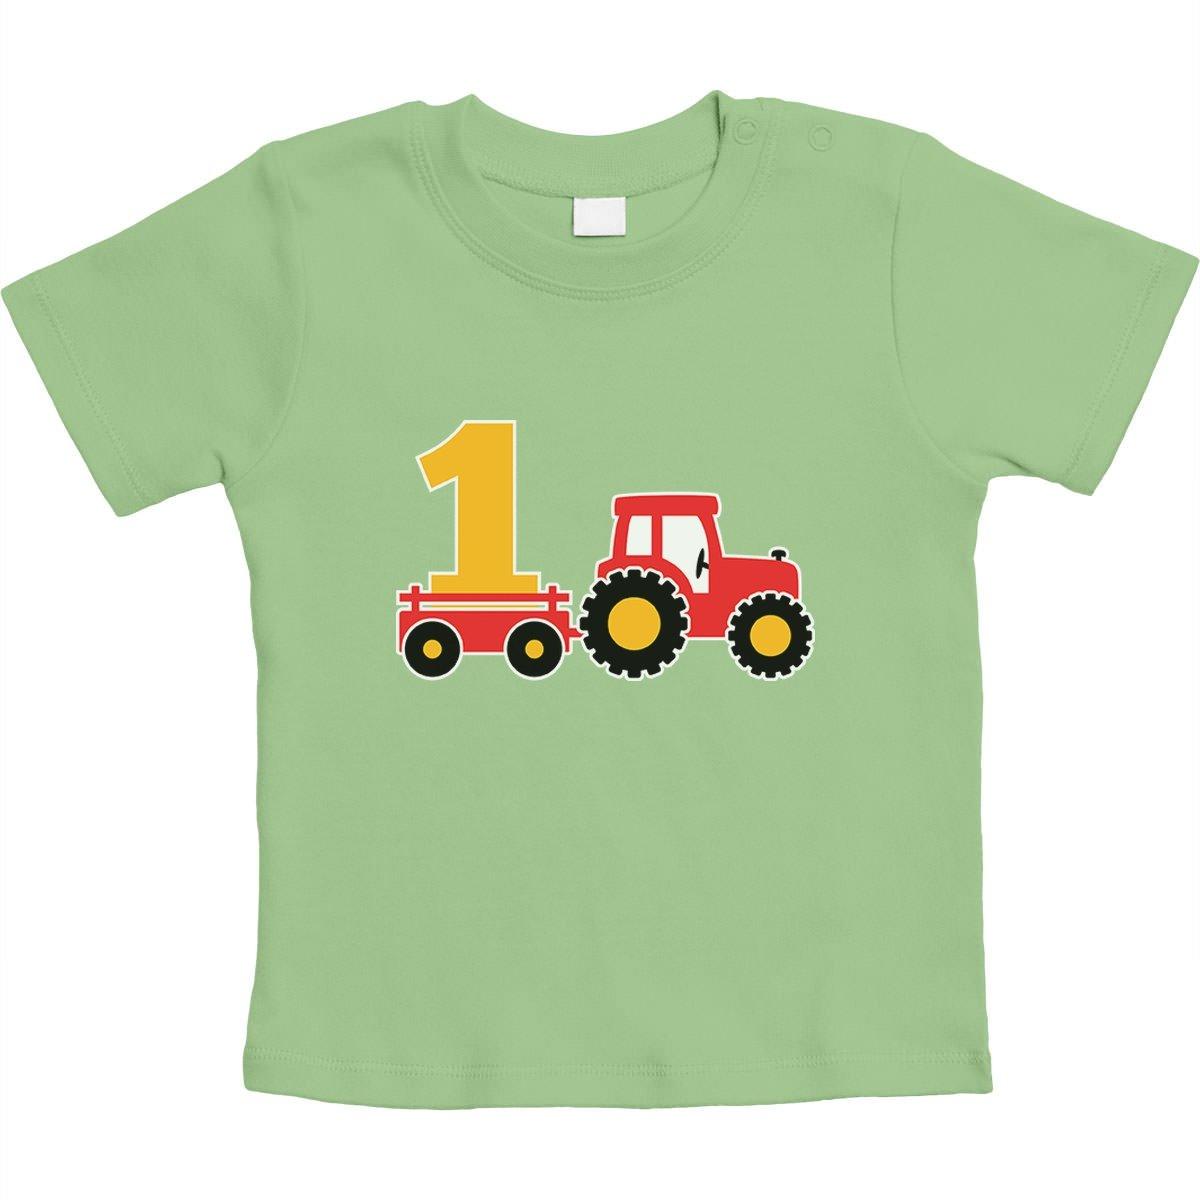 1 Jahr Geburtstag Junge Geschenk Traktor Bagger Unisex Baby T-Shirt Gr. 66-93 VSCSDQC68E